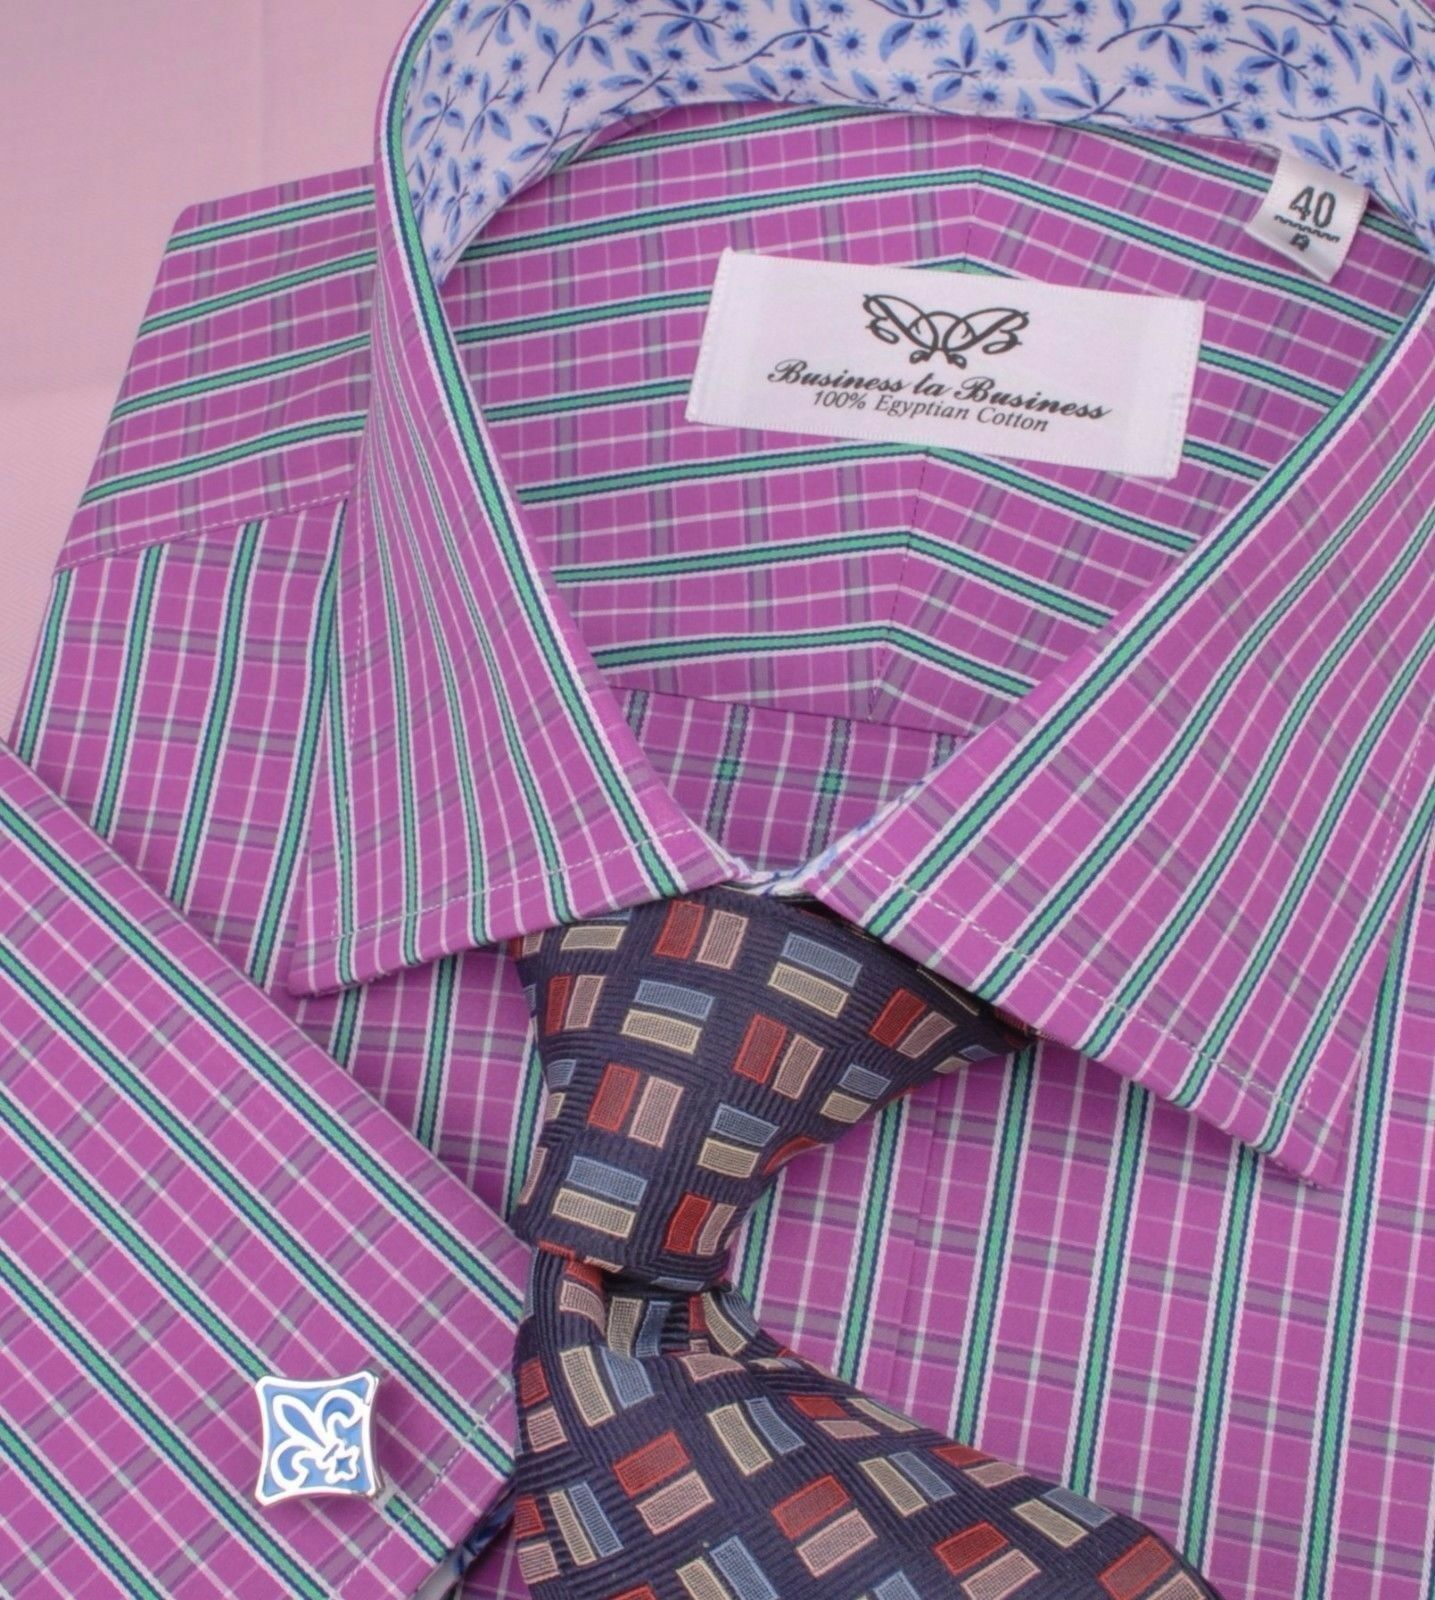 ROT Striped Floral Formal Geschäft Dress Shirt Weiß Contrast Collar French Cuff